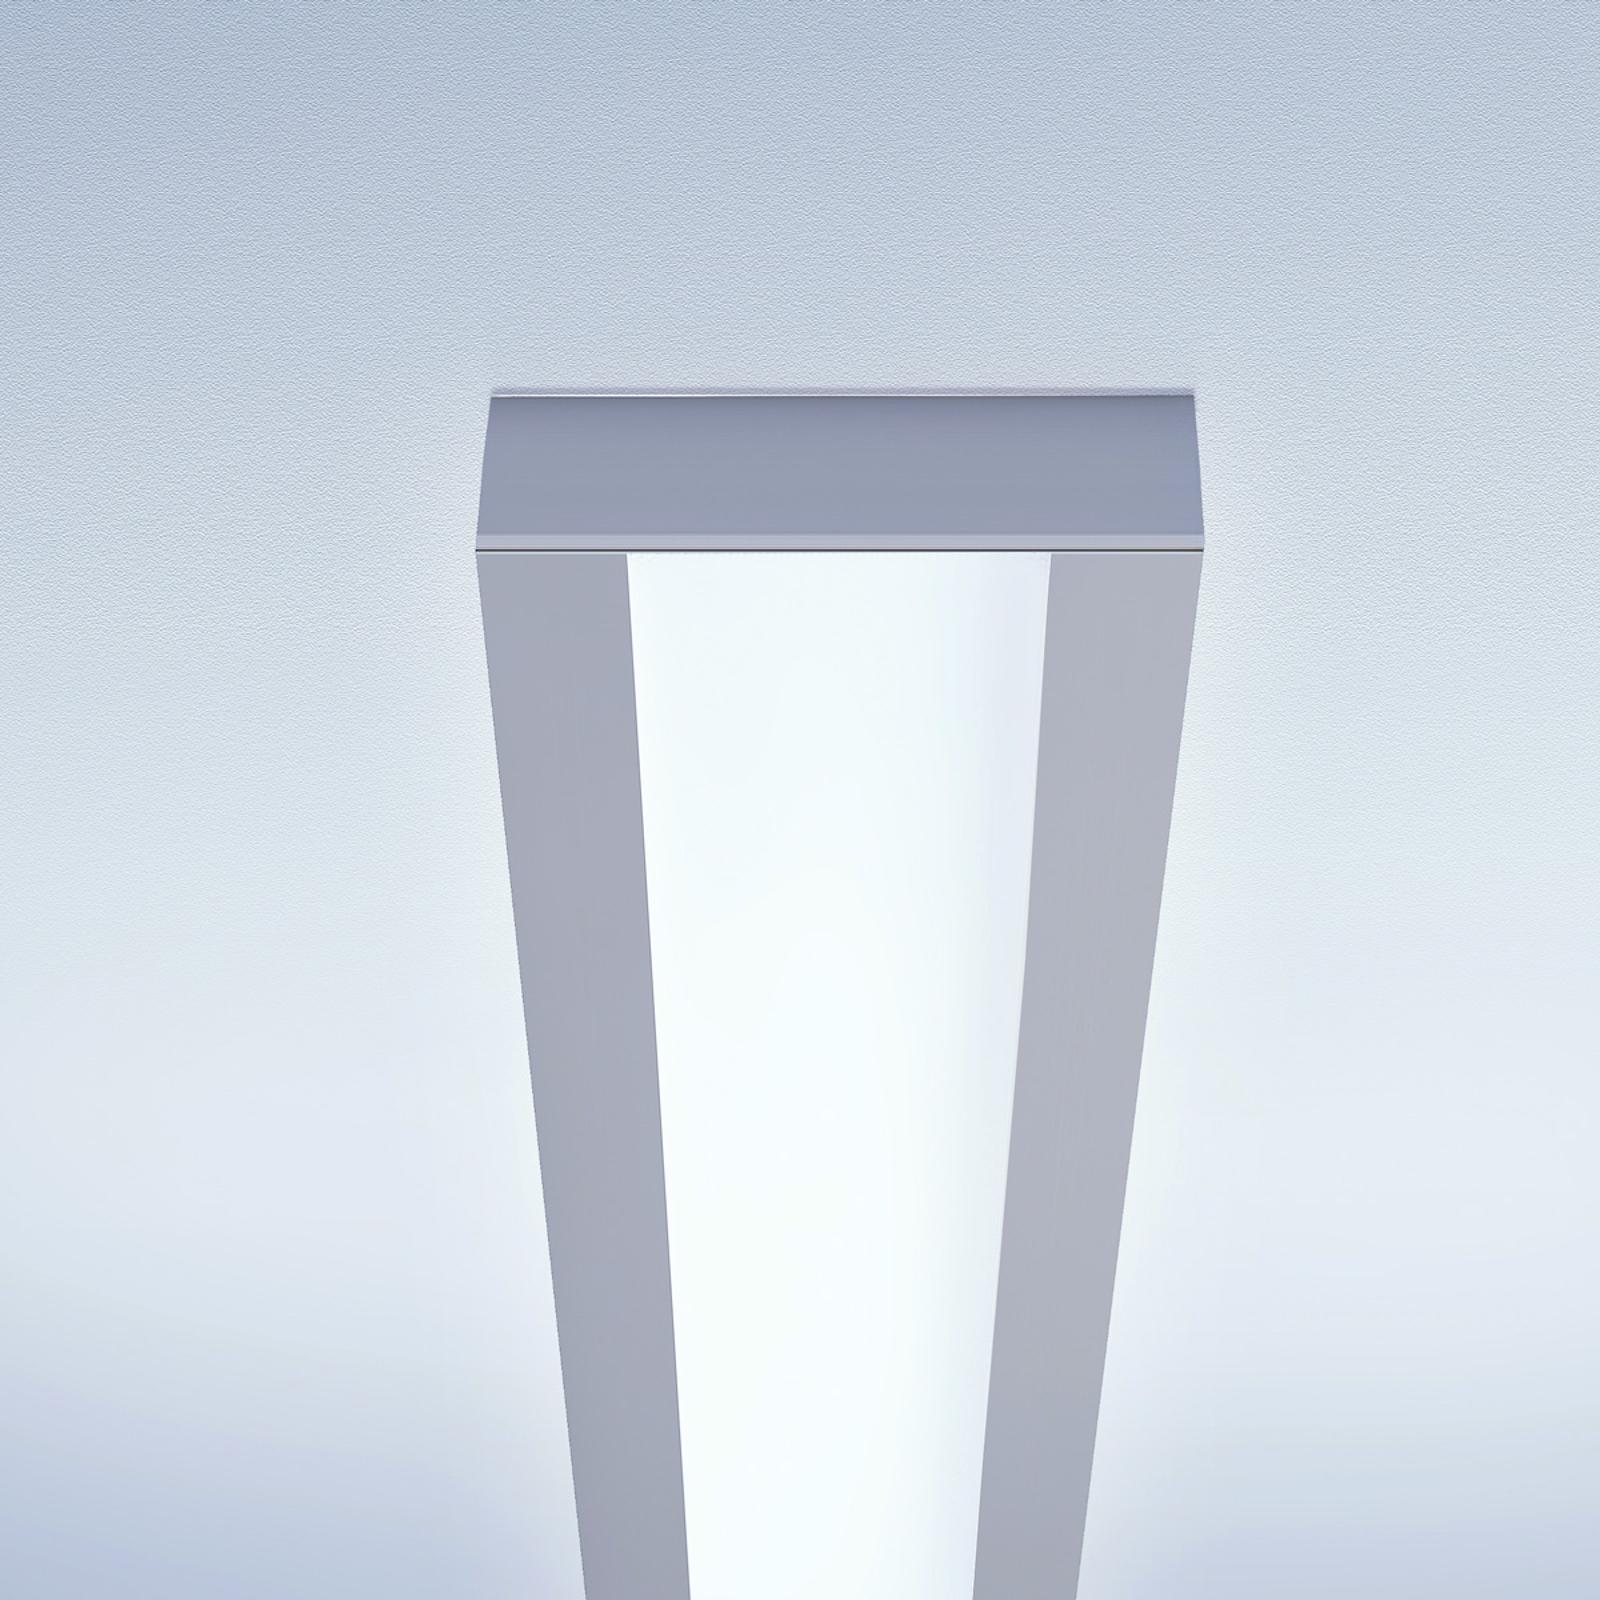 Vision-A2 utenpåliggende taklampe LED 176,5 cm